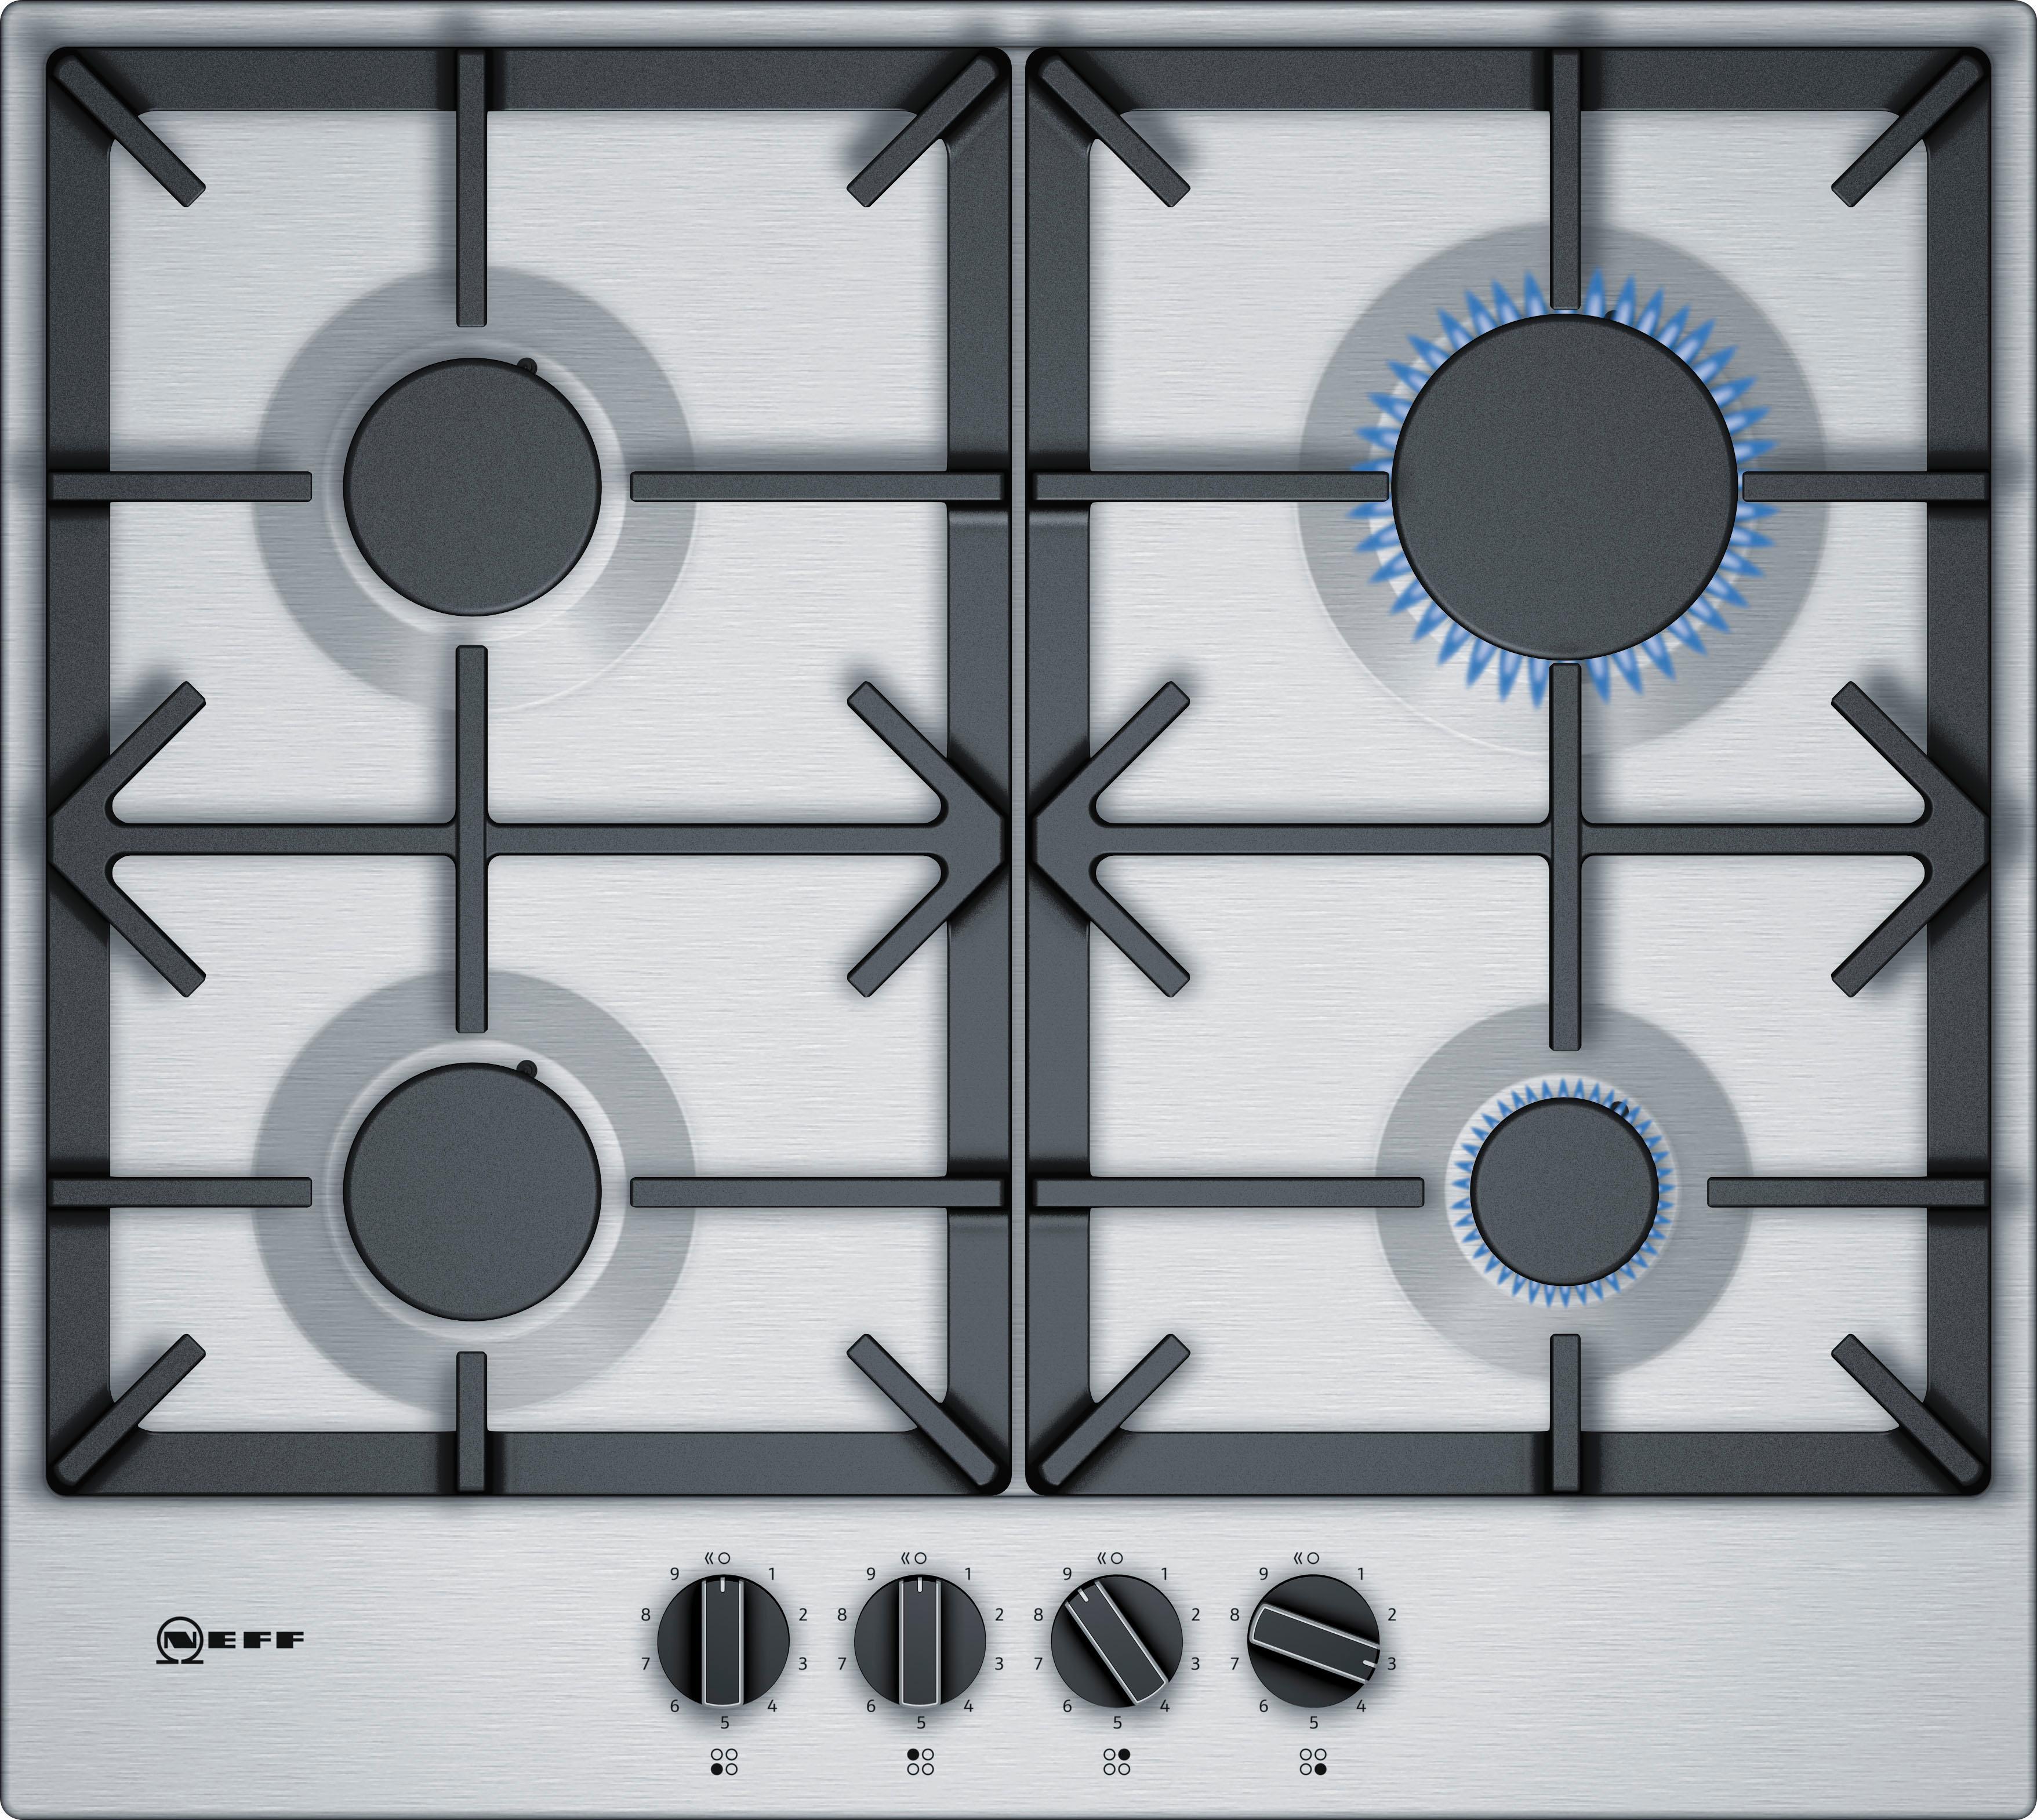 rabatt tds2649n gas kochstelle. Black Bedroom Furniture Sets. Home Design Ideas